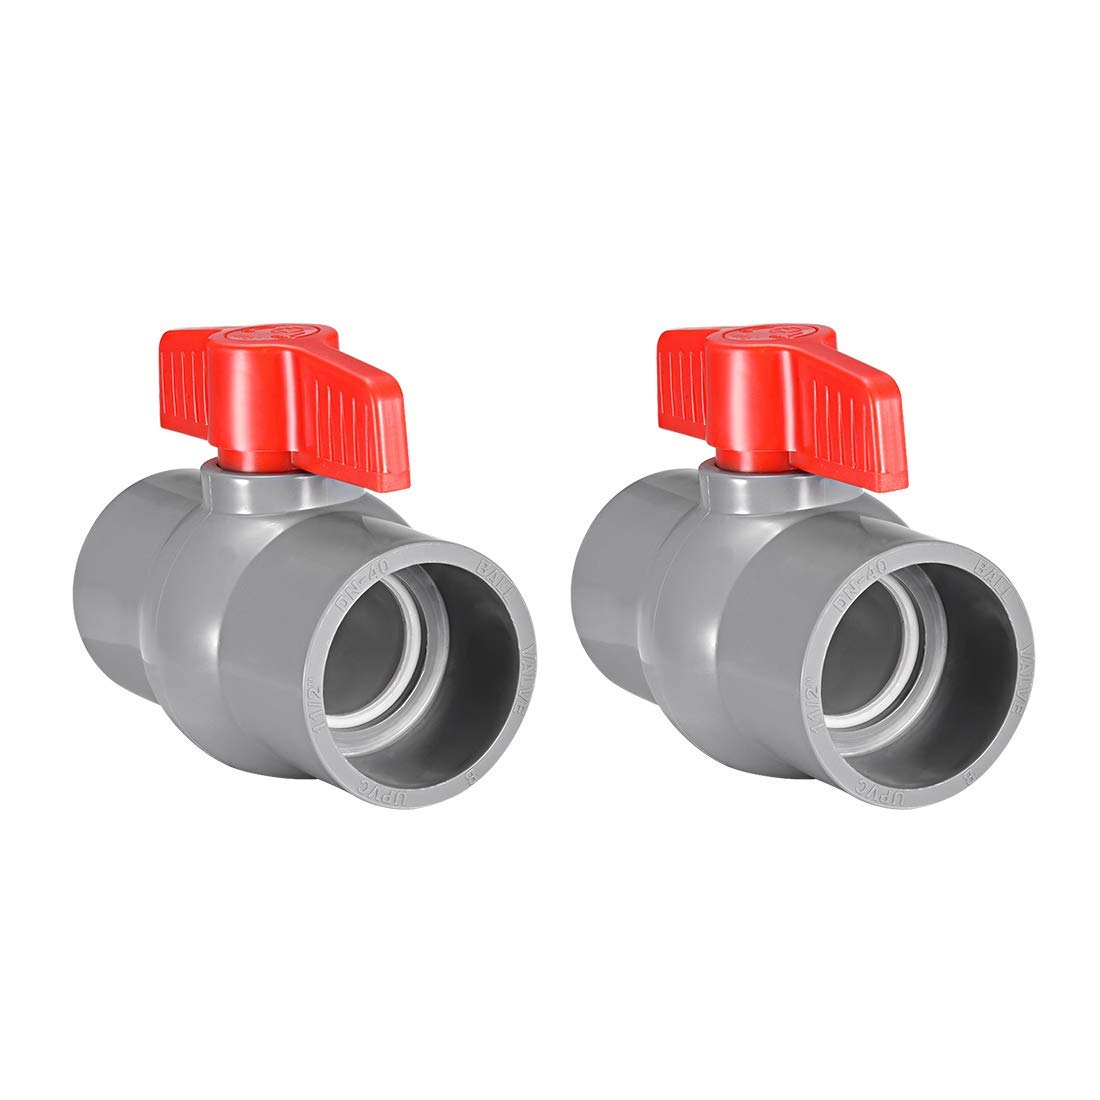 PVC Ball Valve Supply Tube Sliding knob Sliding Ends 1-1//2 inches Inner Hole Diameter Red Gray 2 Pieces